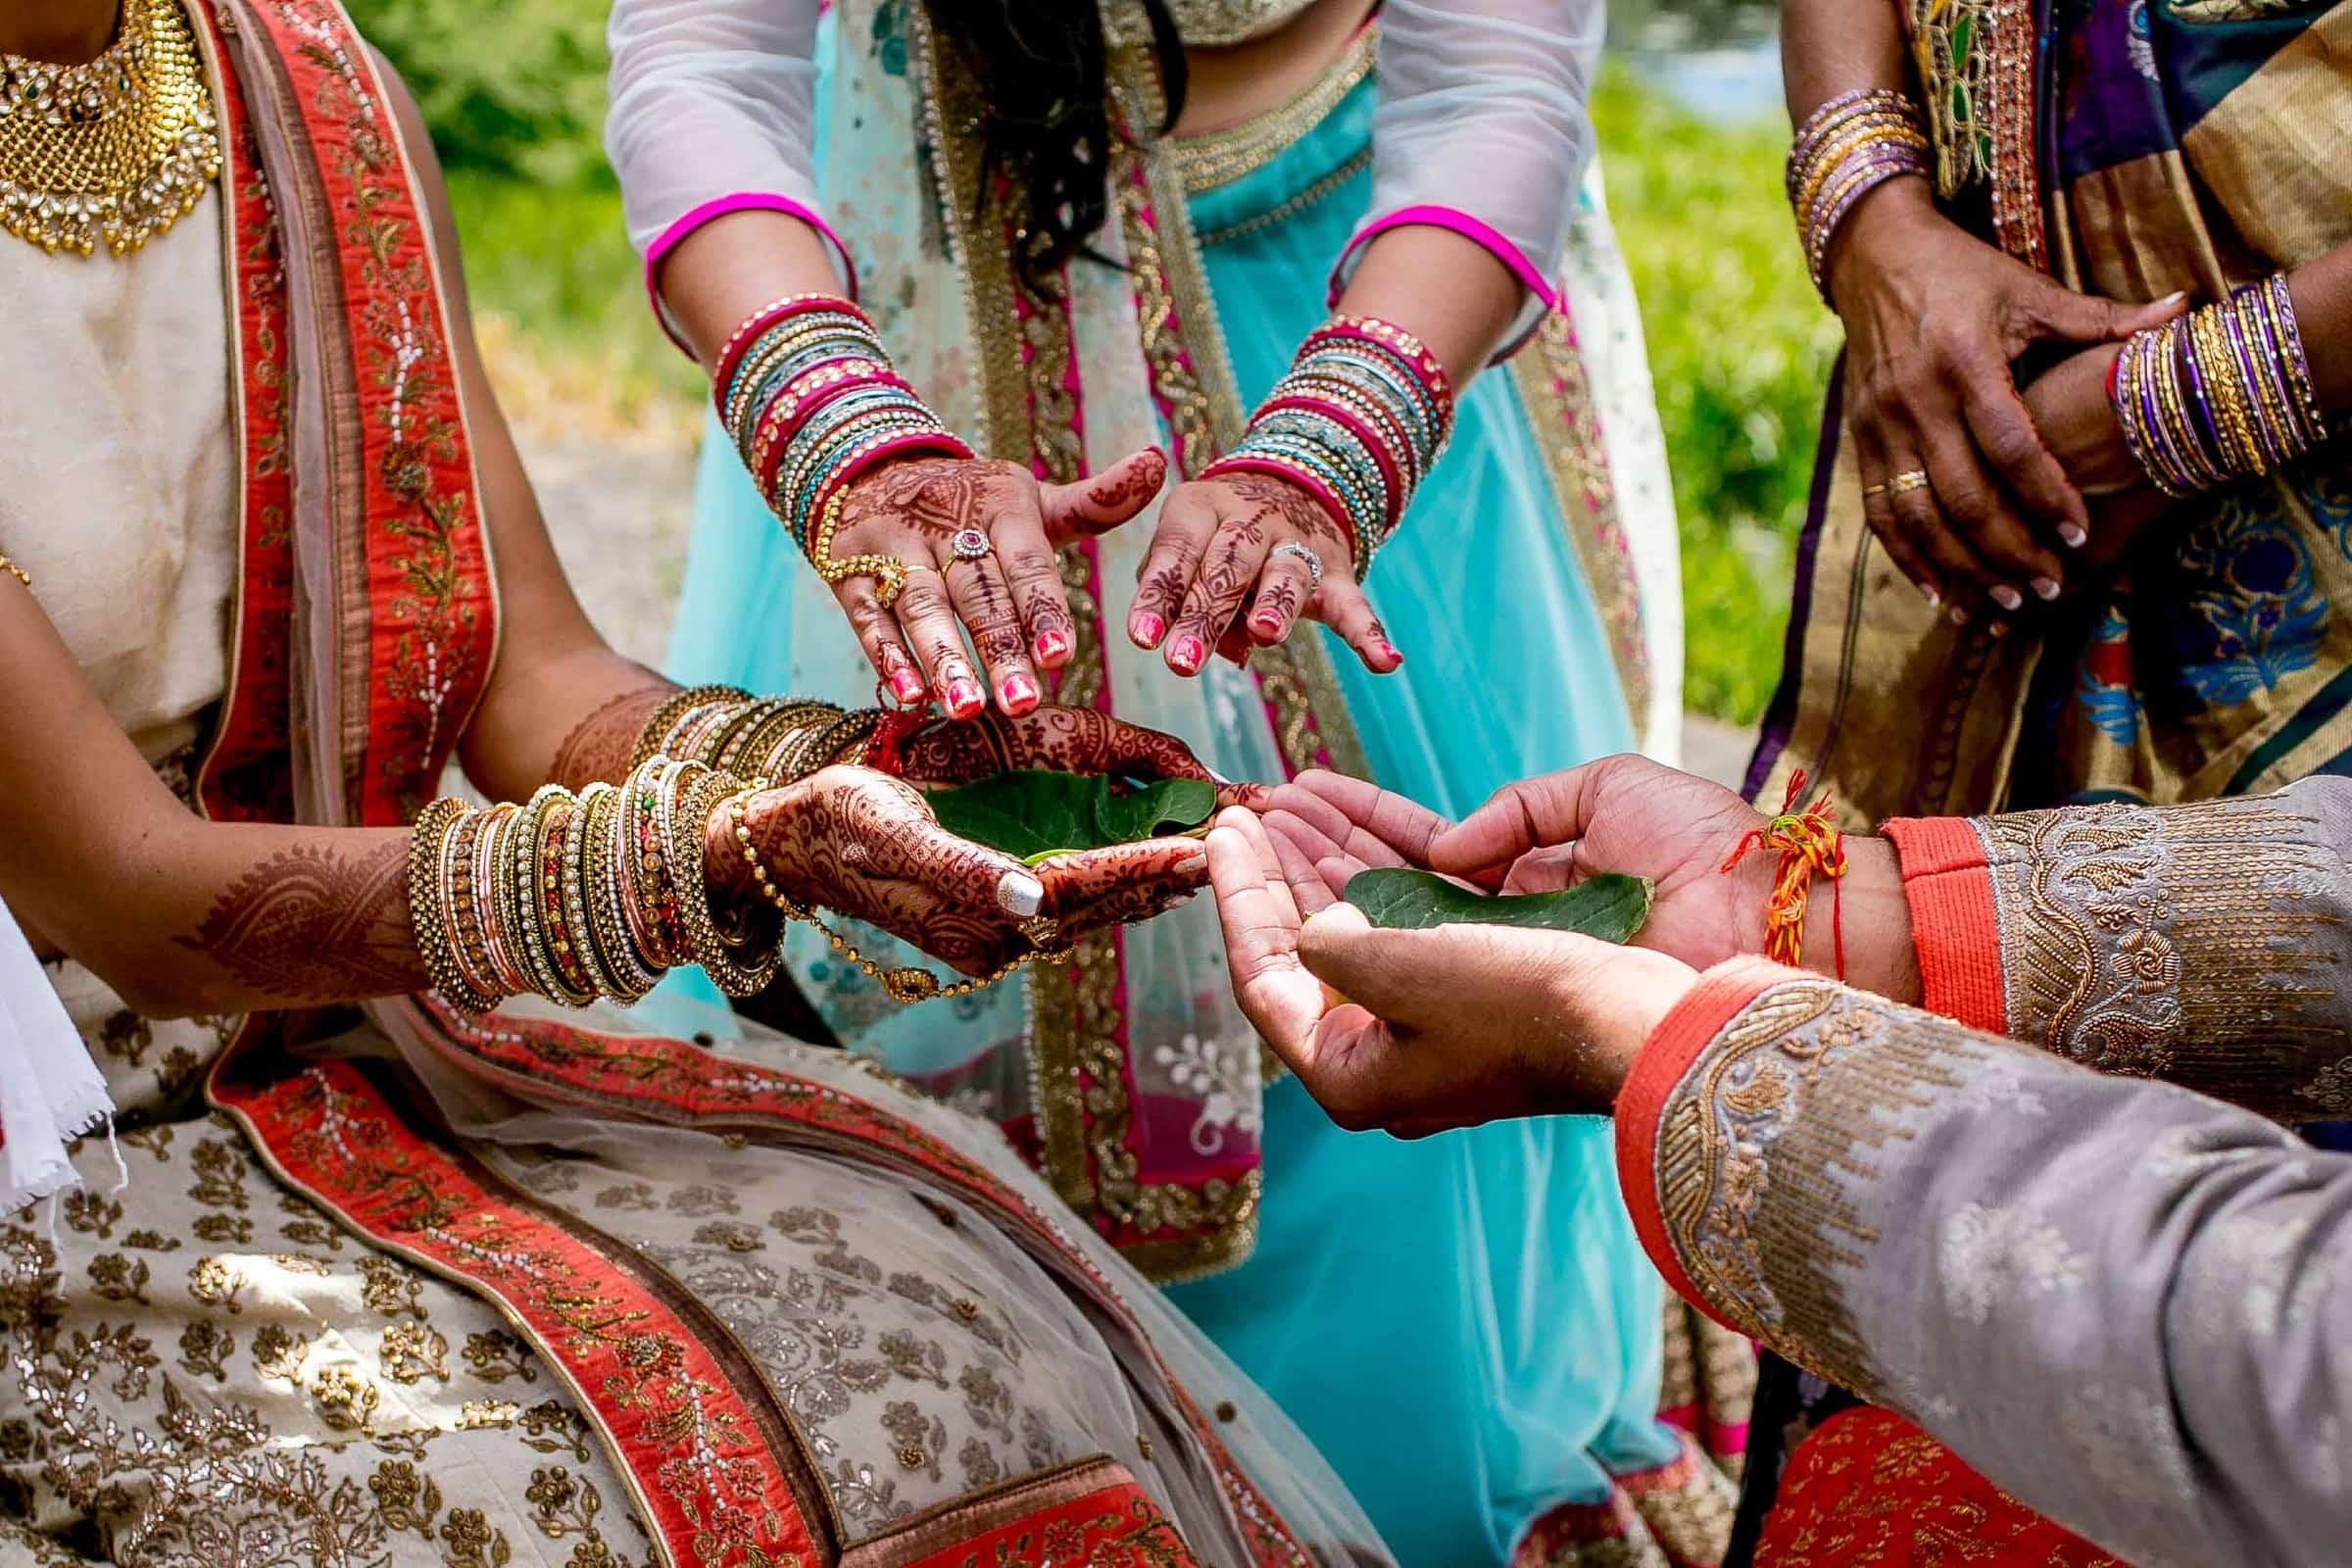 Colorful hands during an Indian Sunriver Resort wedding in Bend Oregon in Central Oregon.